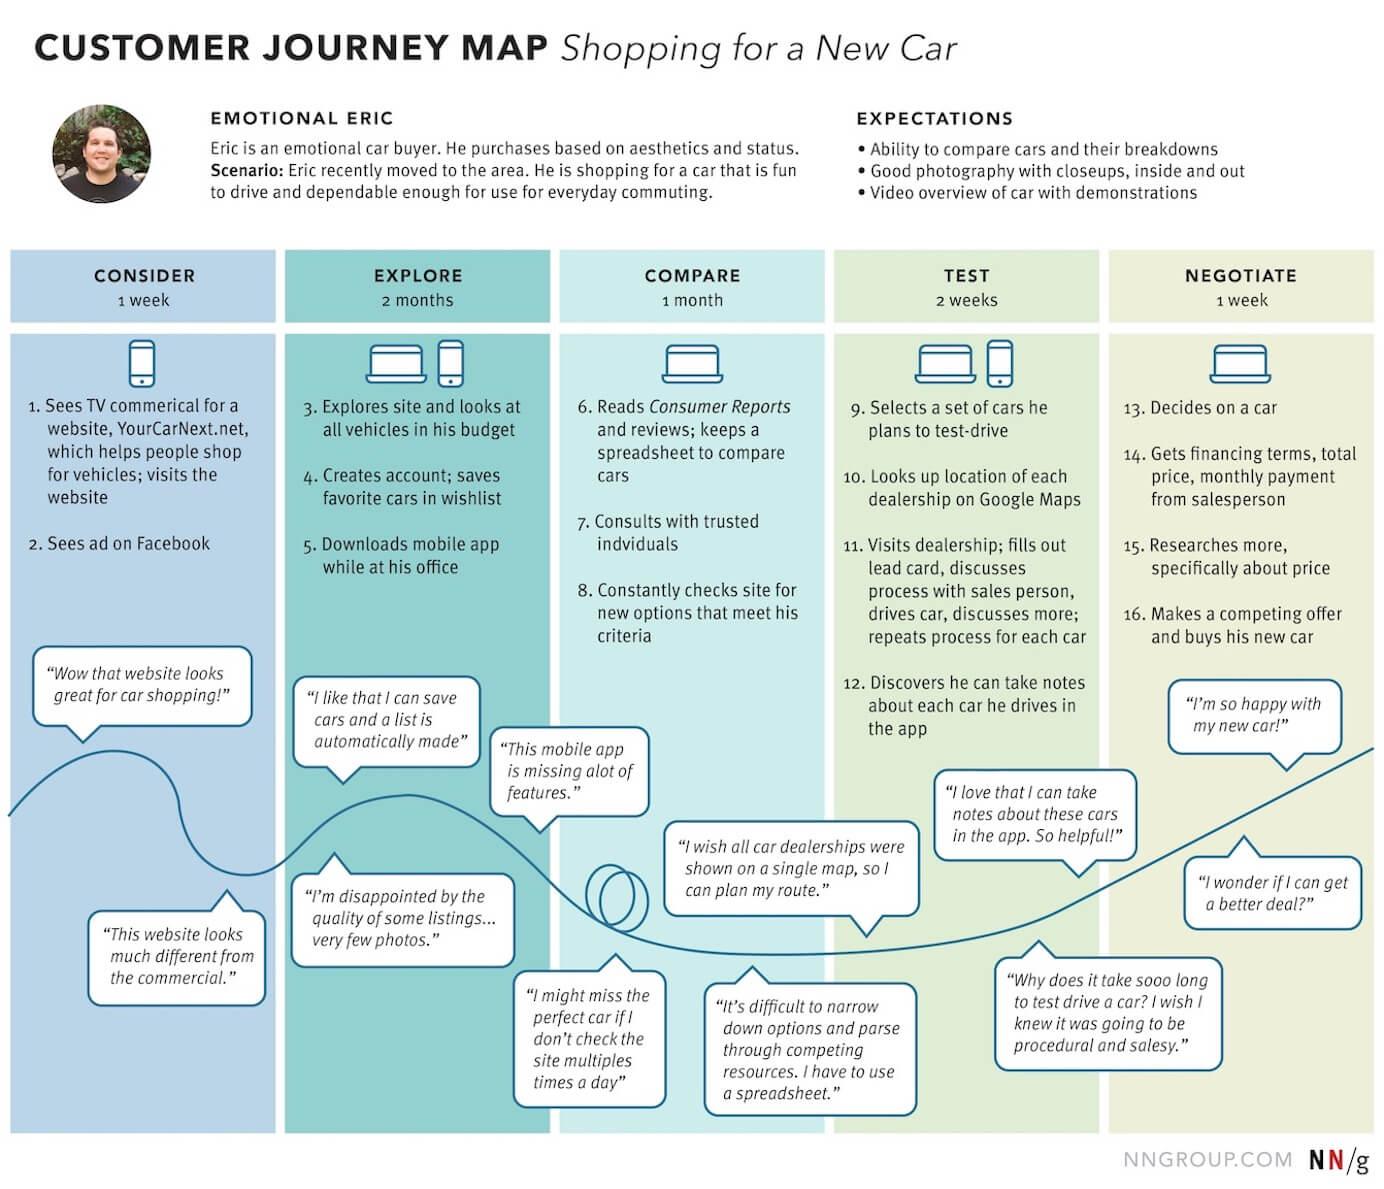 nn-group-customer-journey-map